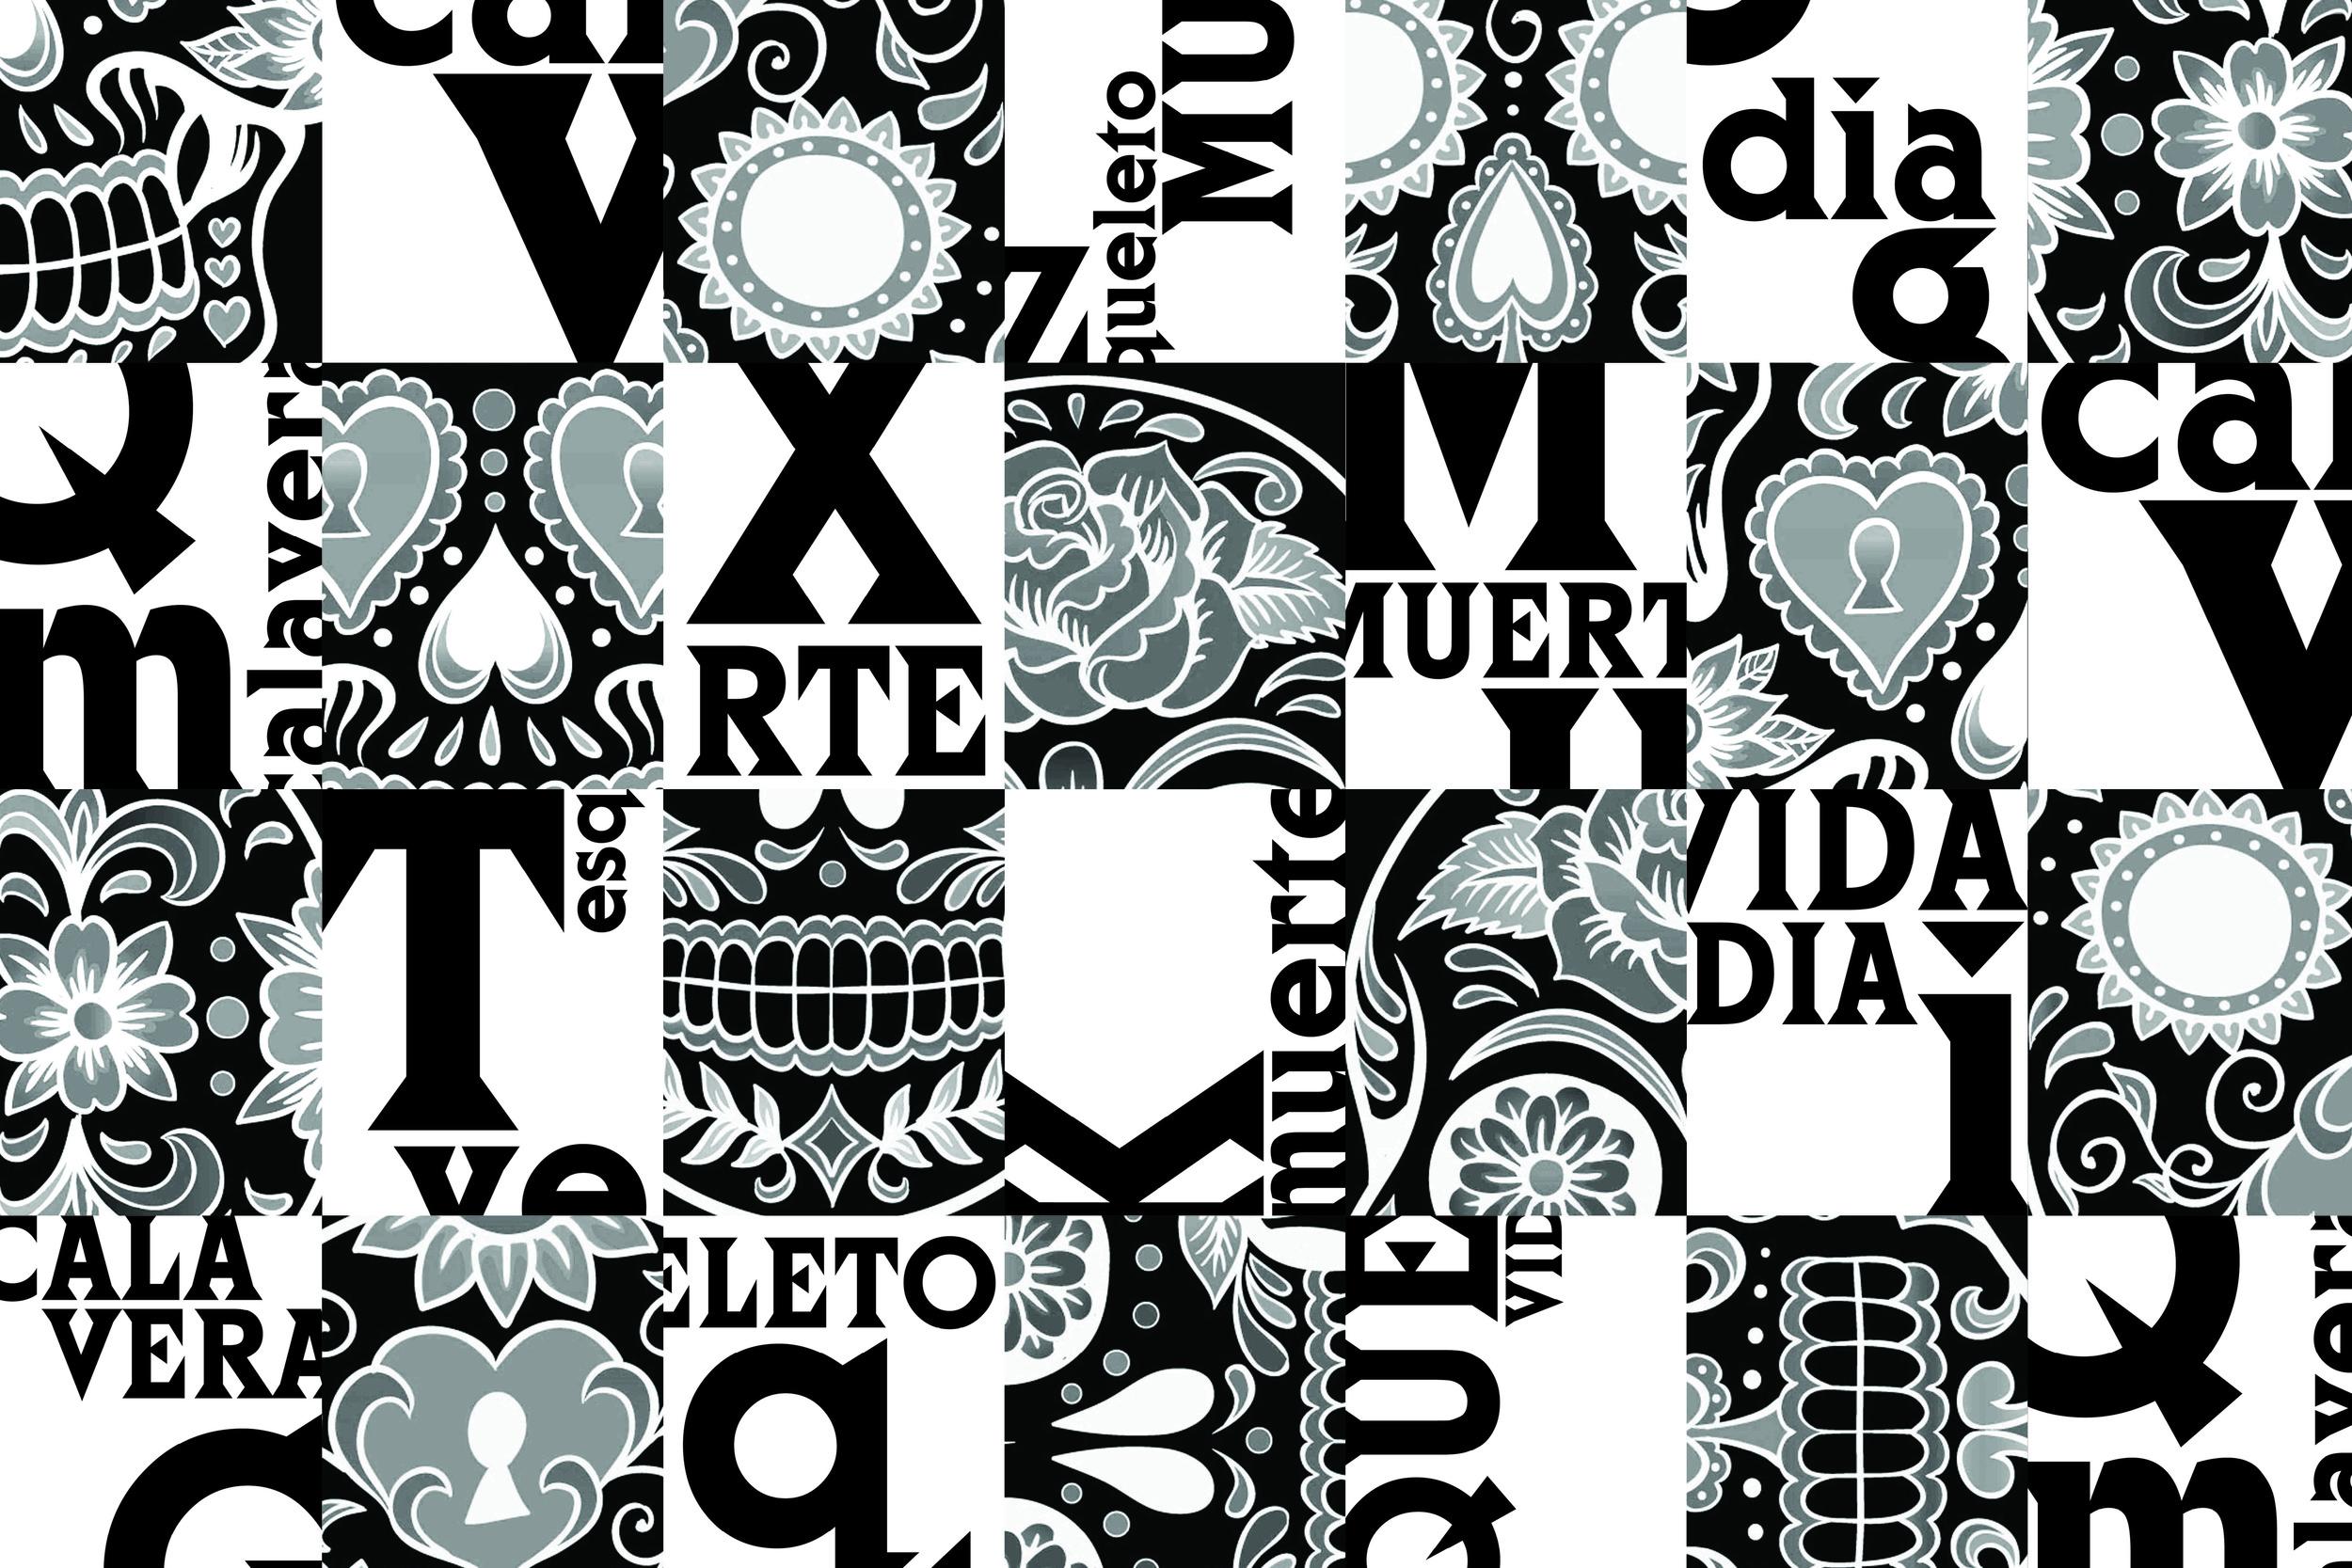 Calaca Wallpaper.jpg